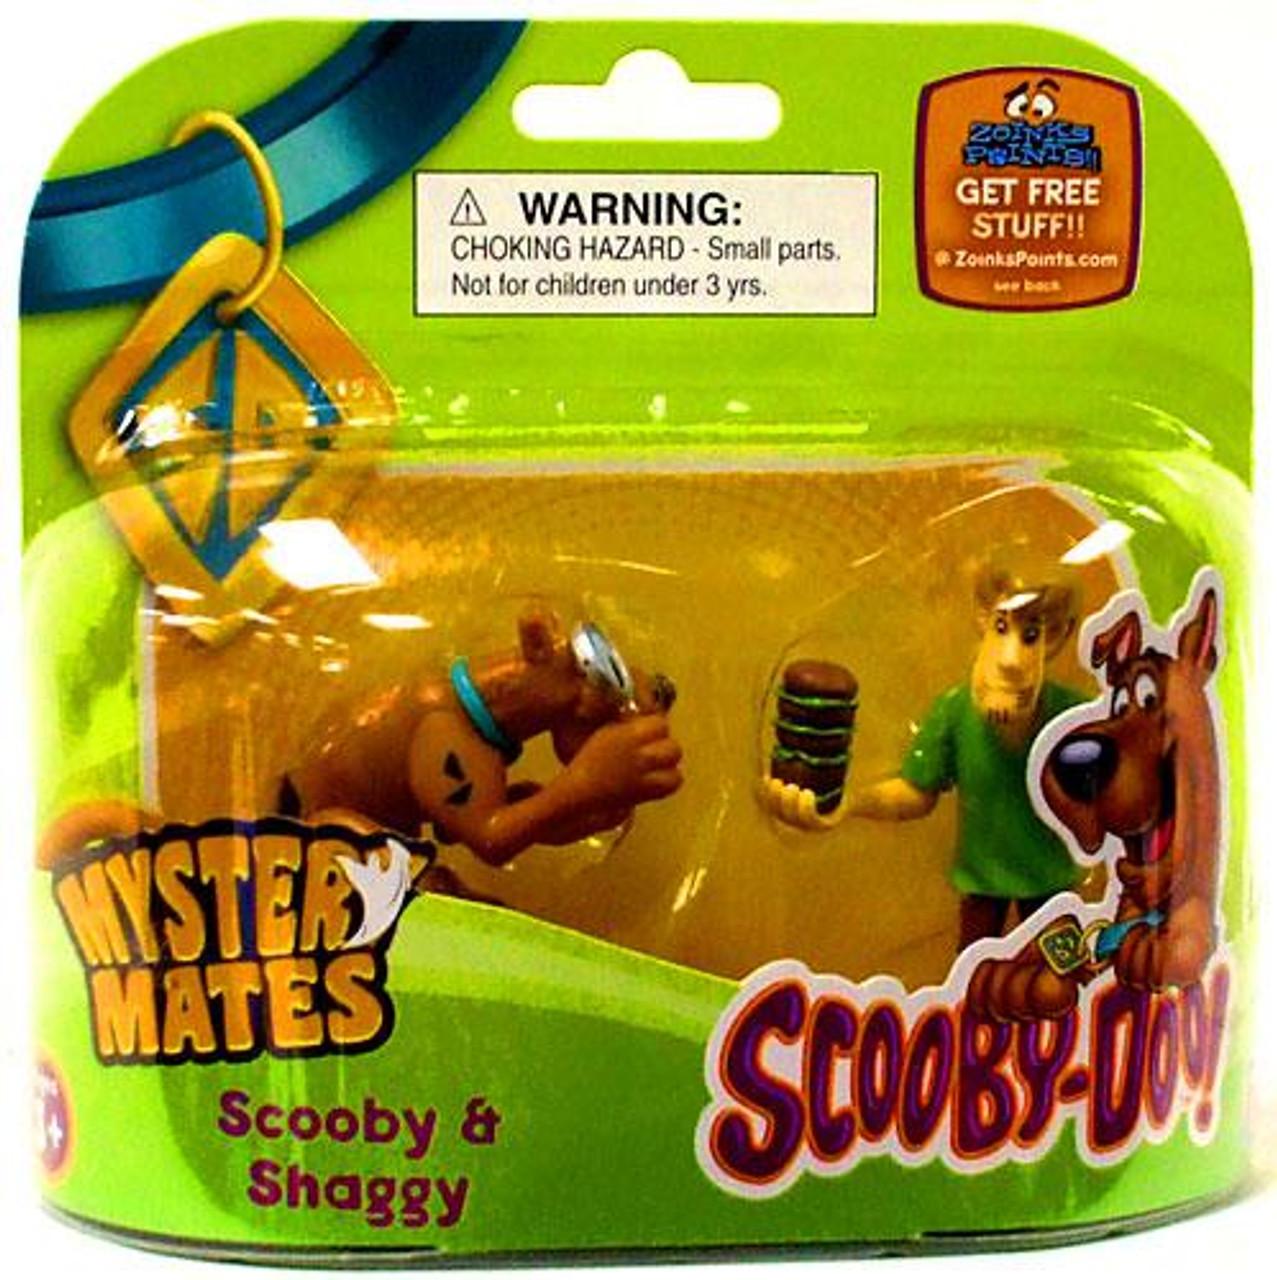 Scooby Doo Mystery Mates Scooby & Shaggy Mini Figure 2-Pack